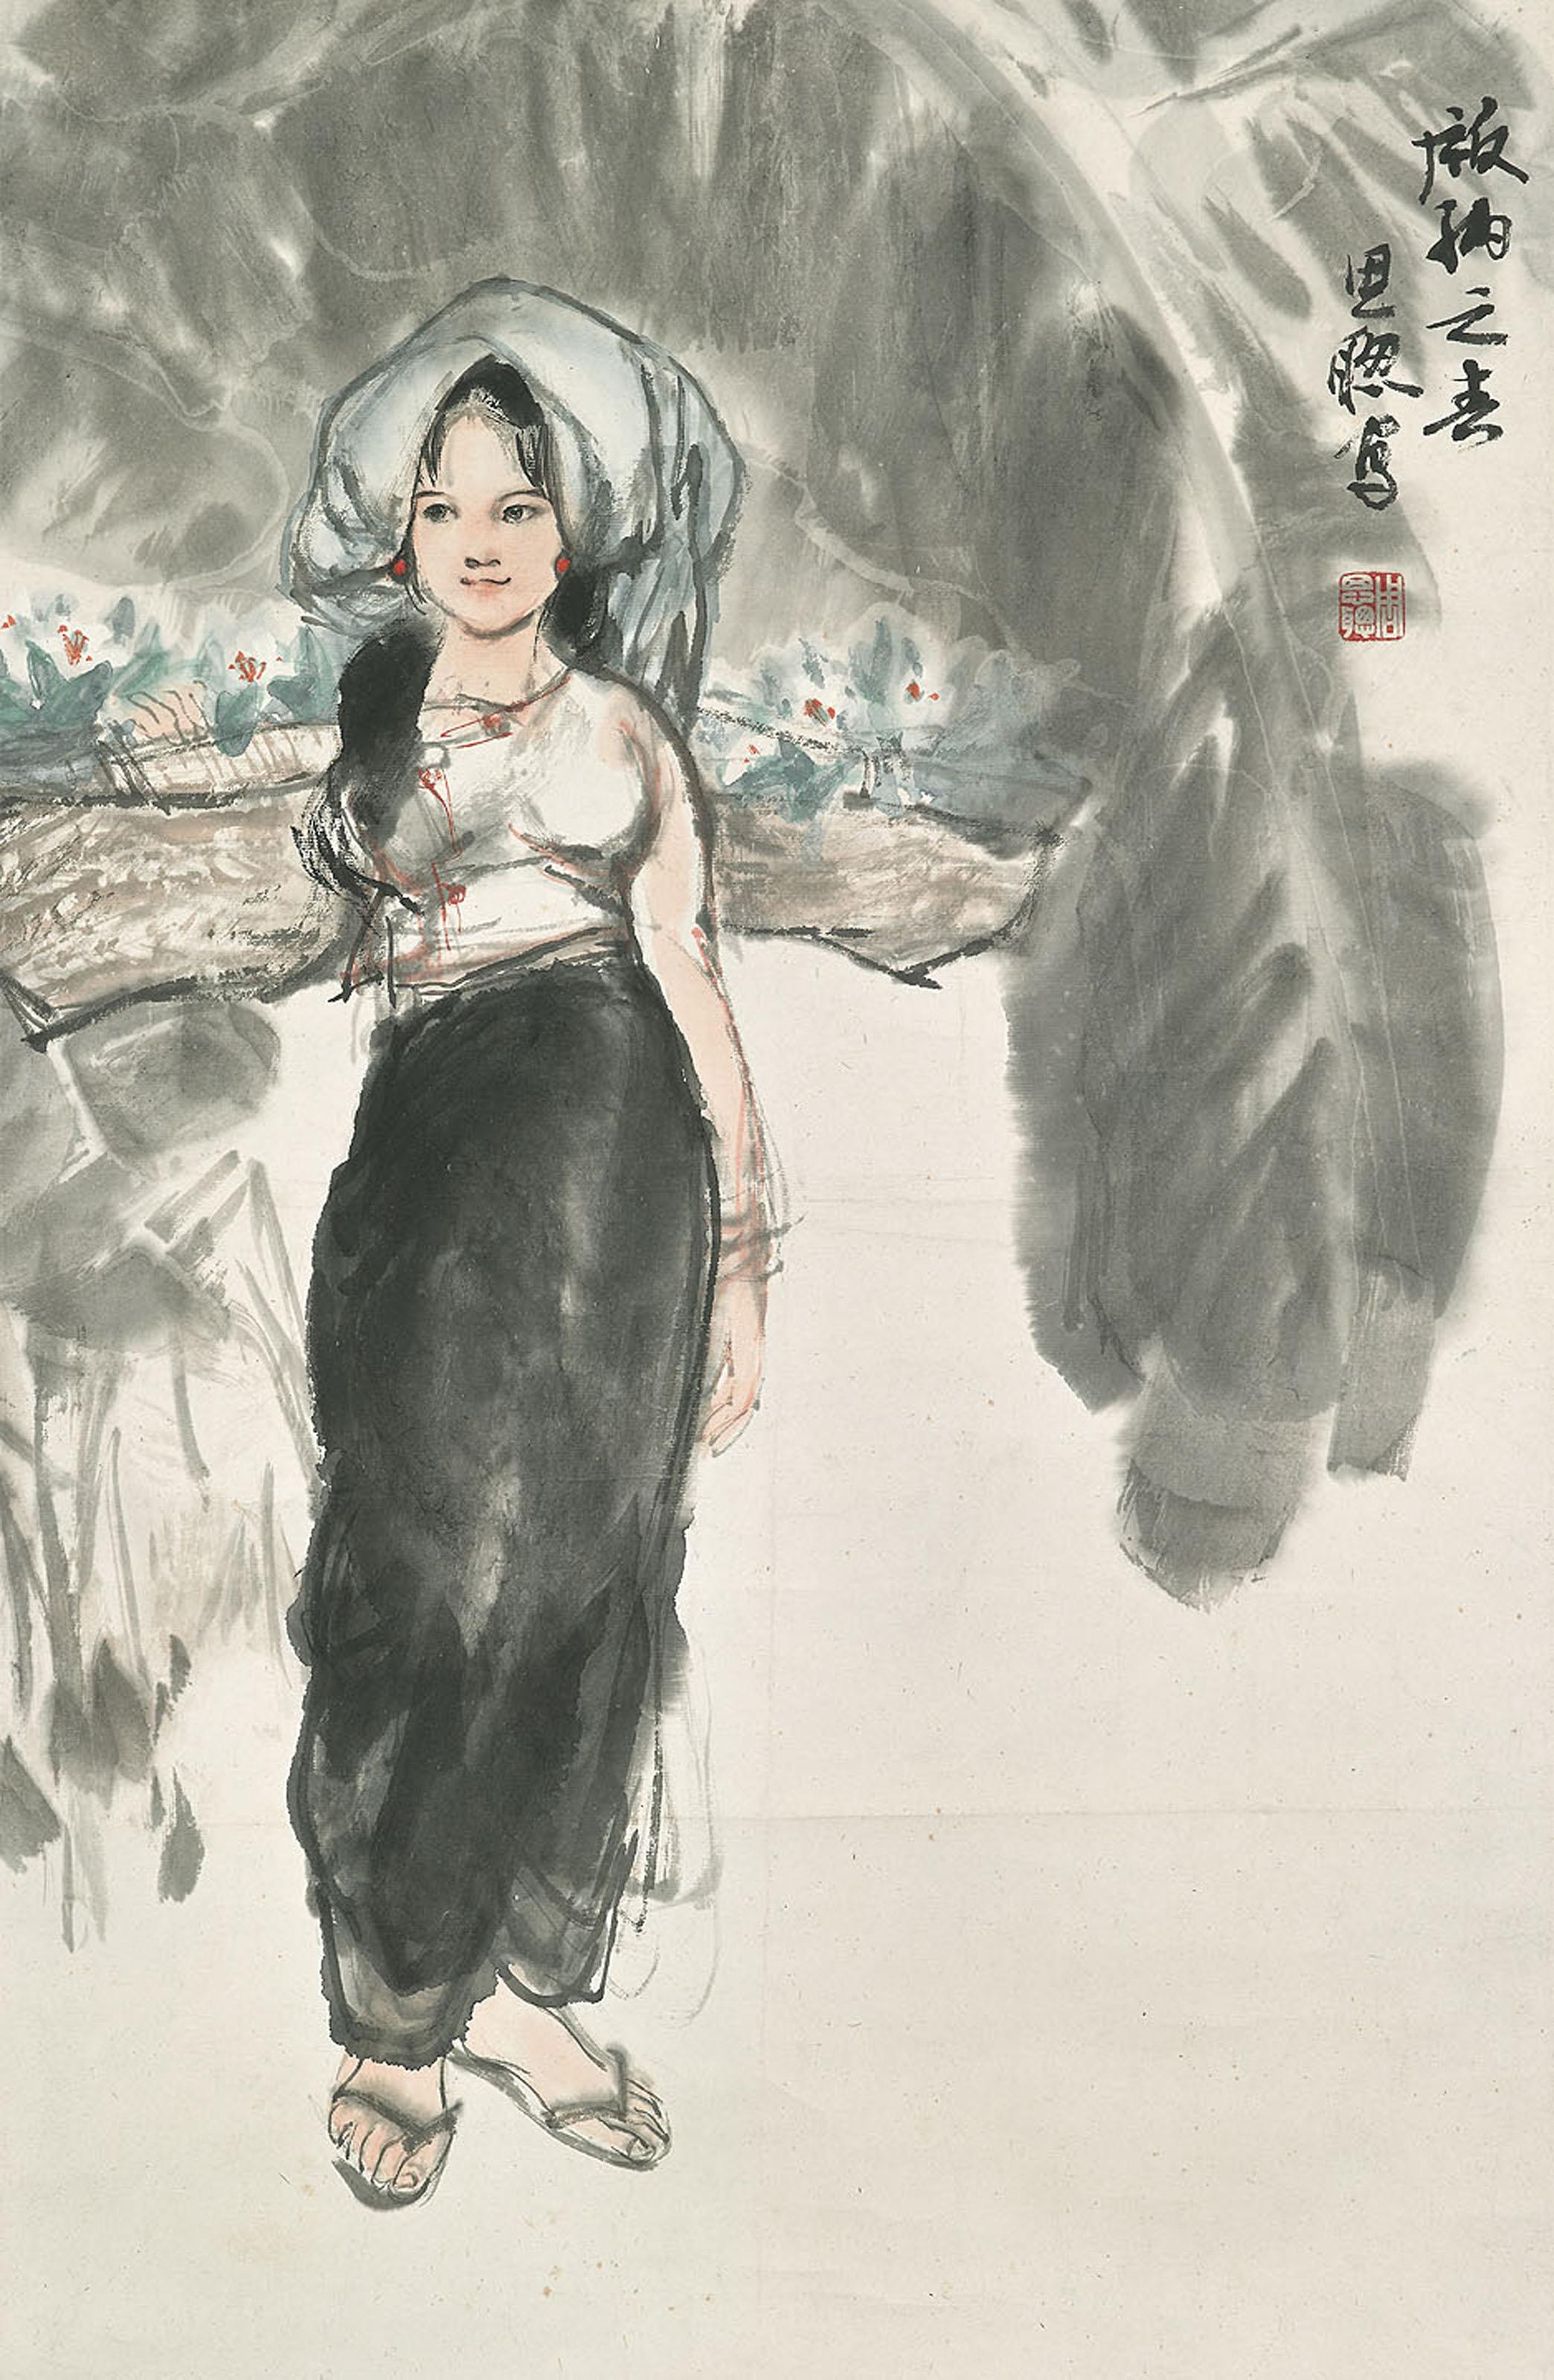 Girl in Xishuangbanna